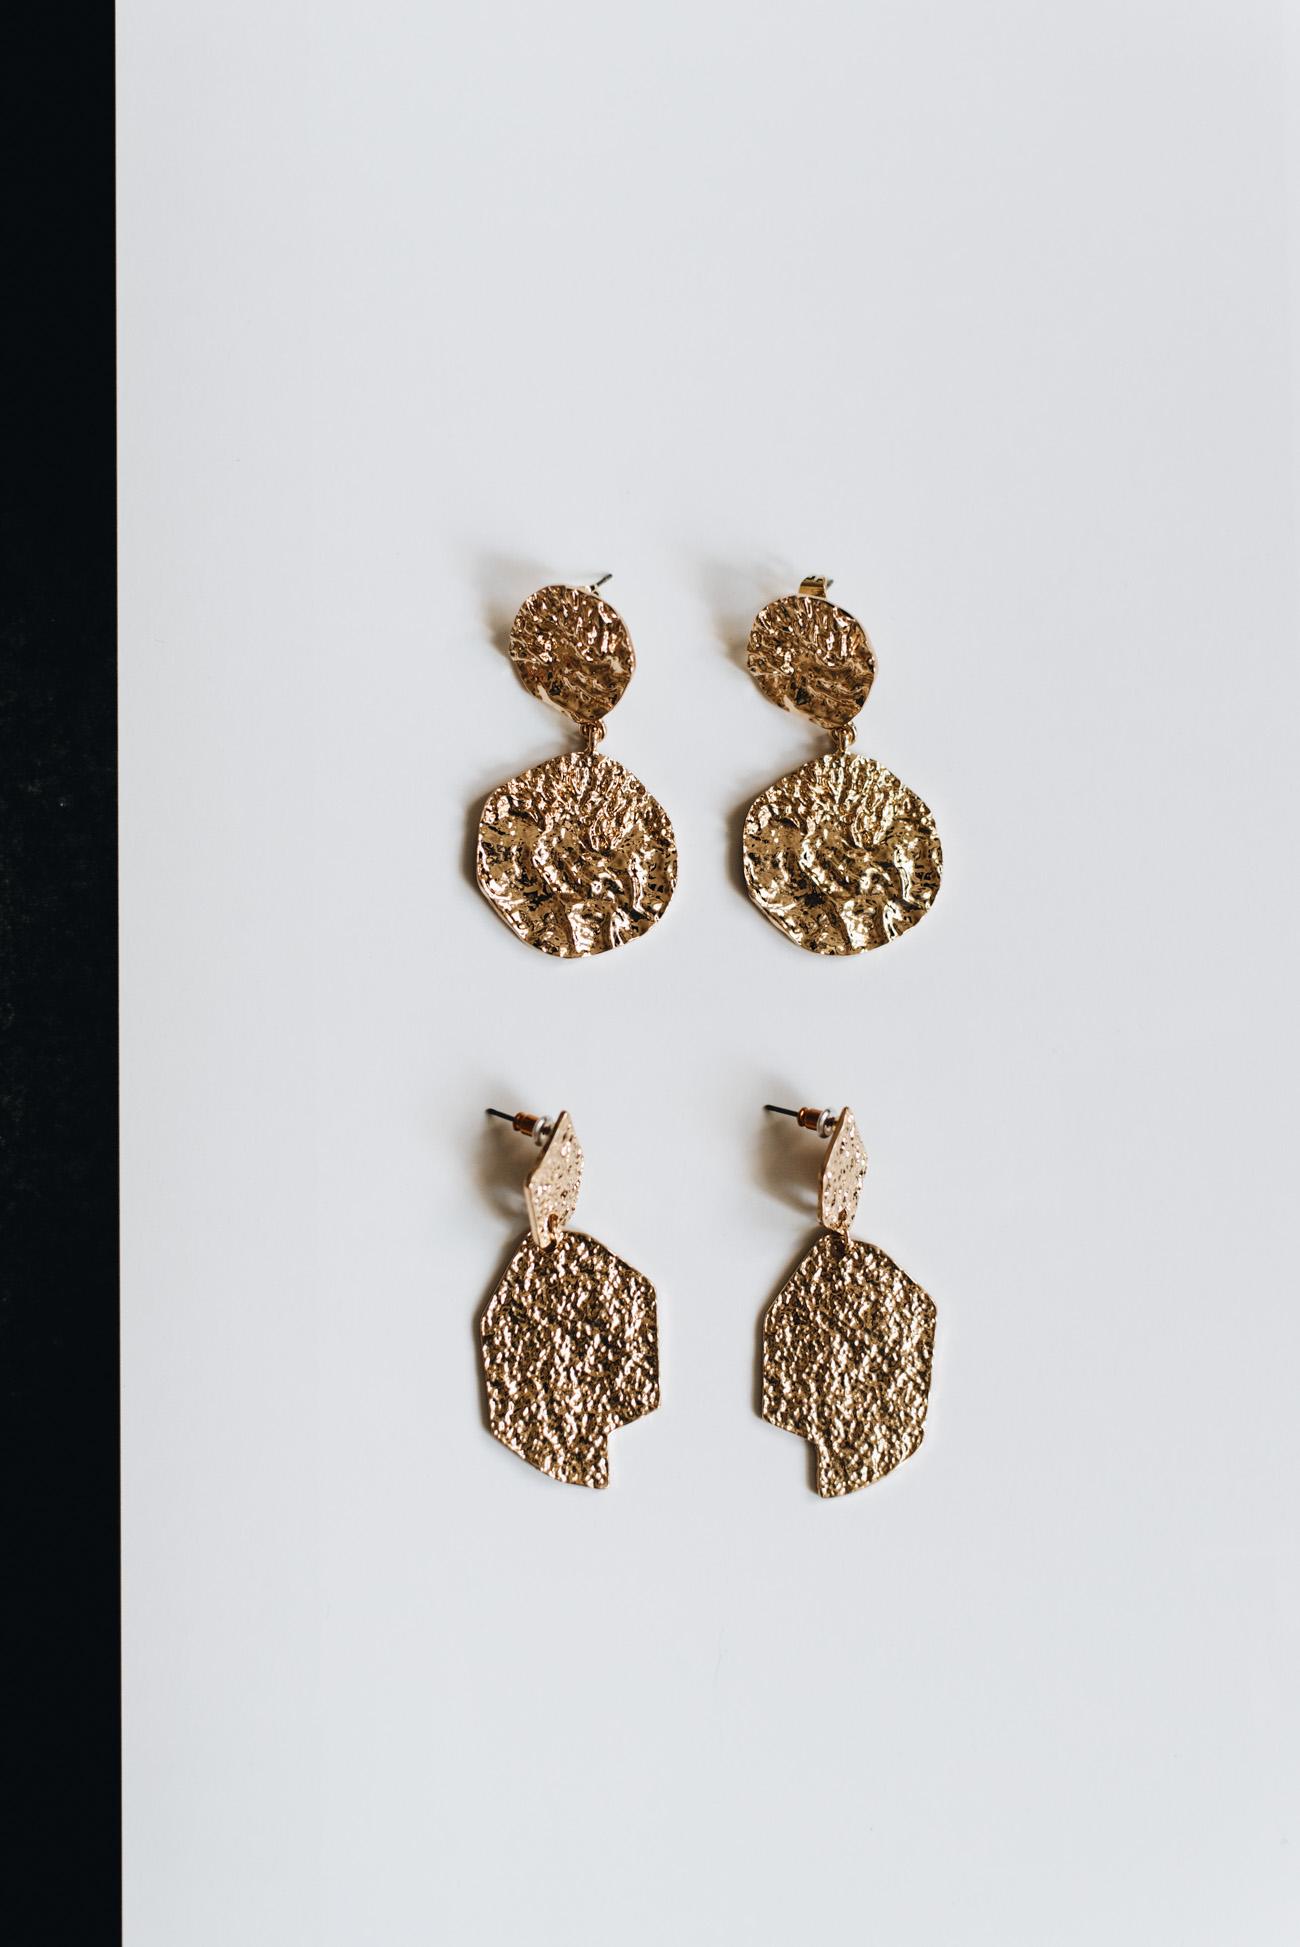 Schmucknews_Mash-Gold_Trend_Ohrringe_Fashiioncarpet